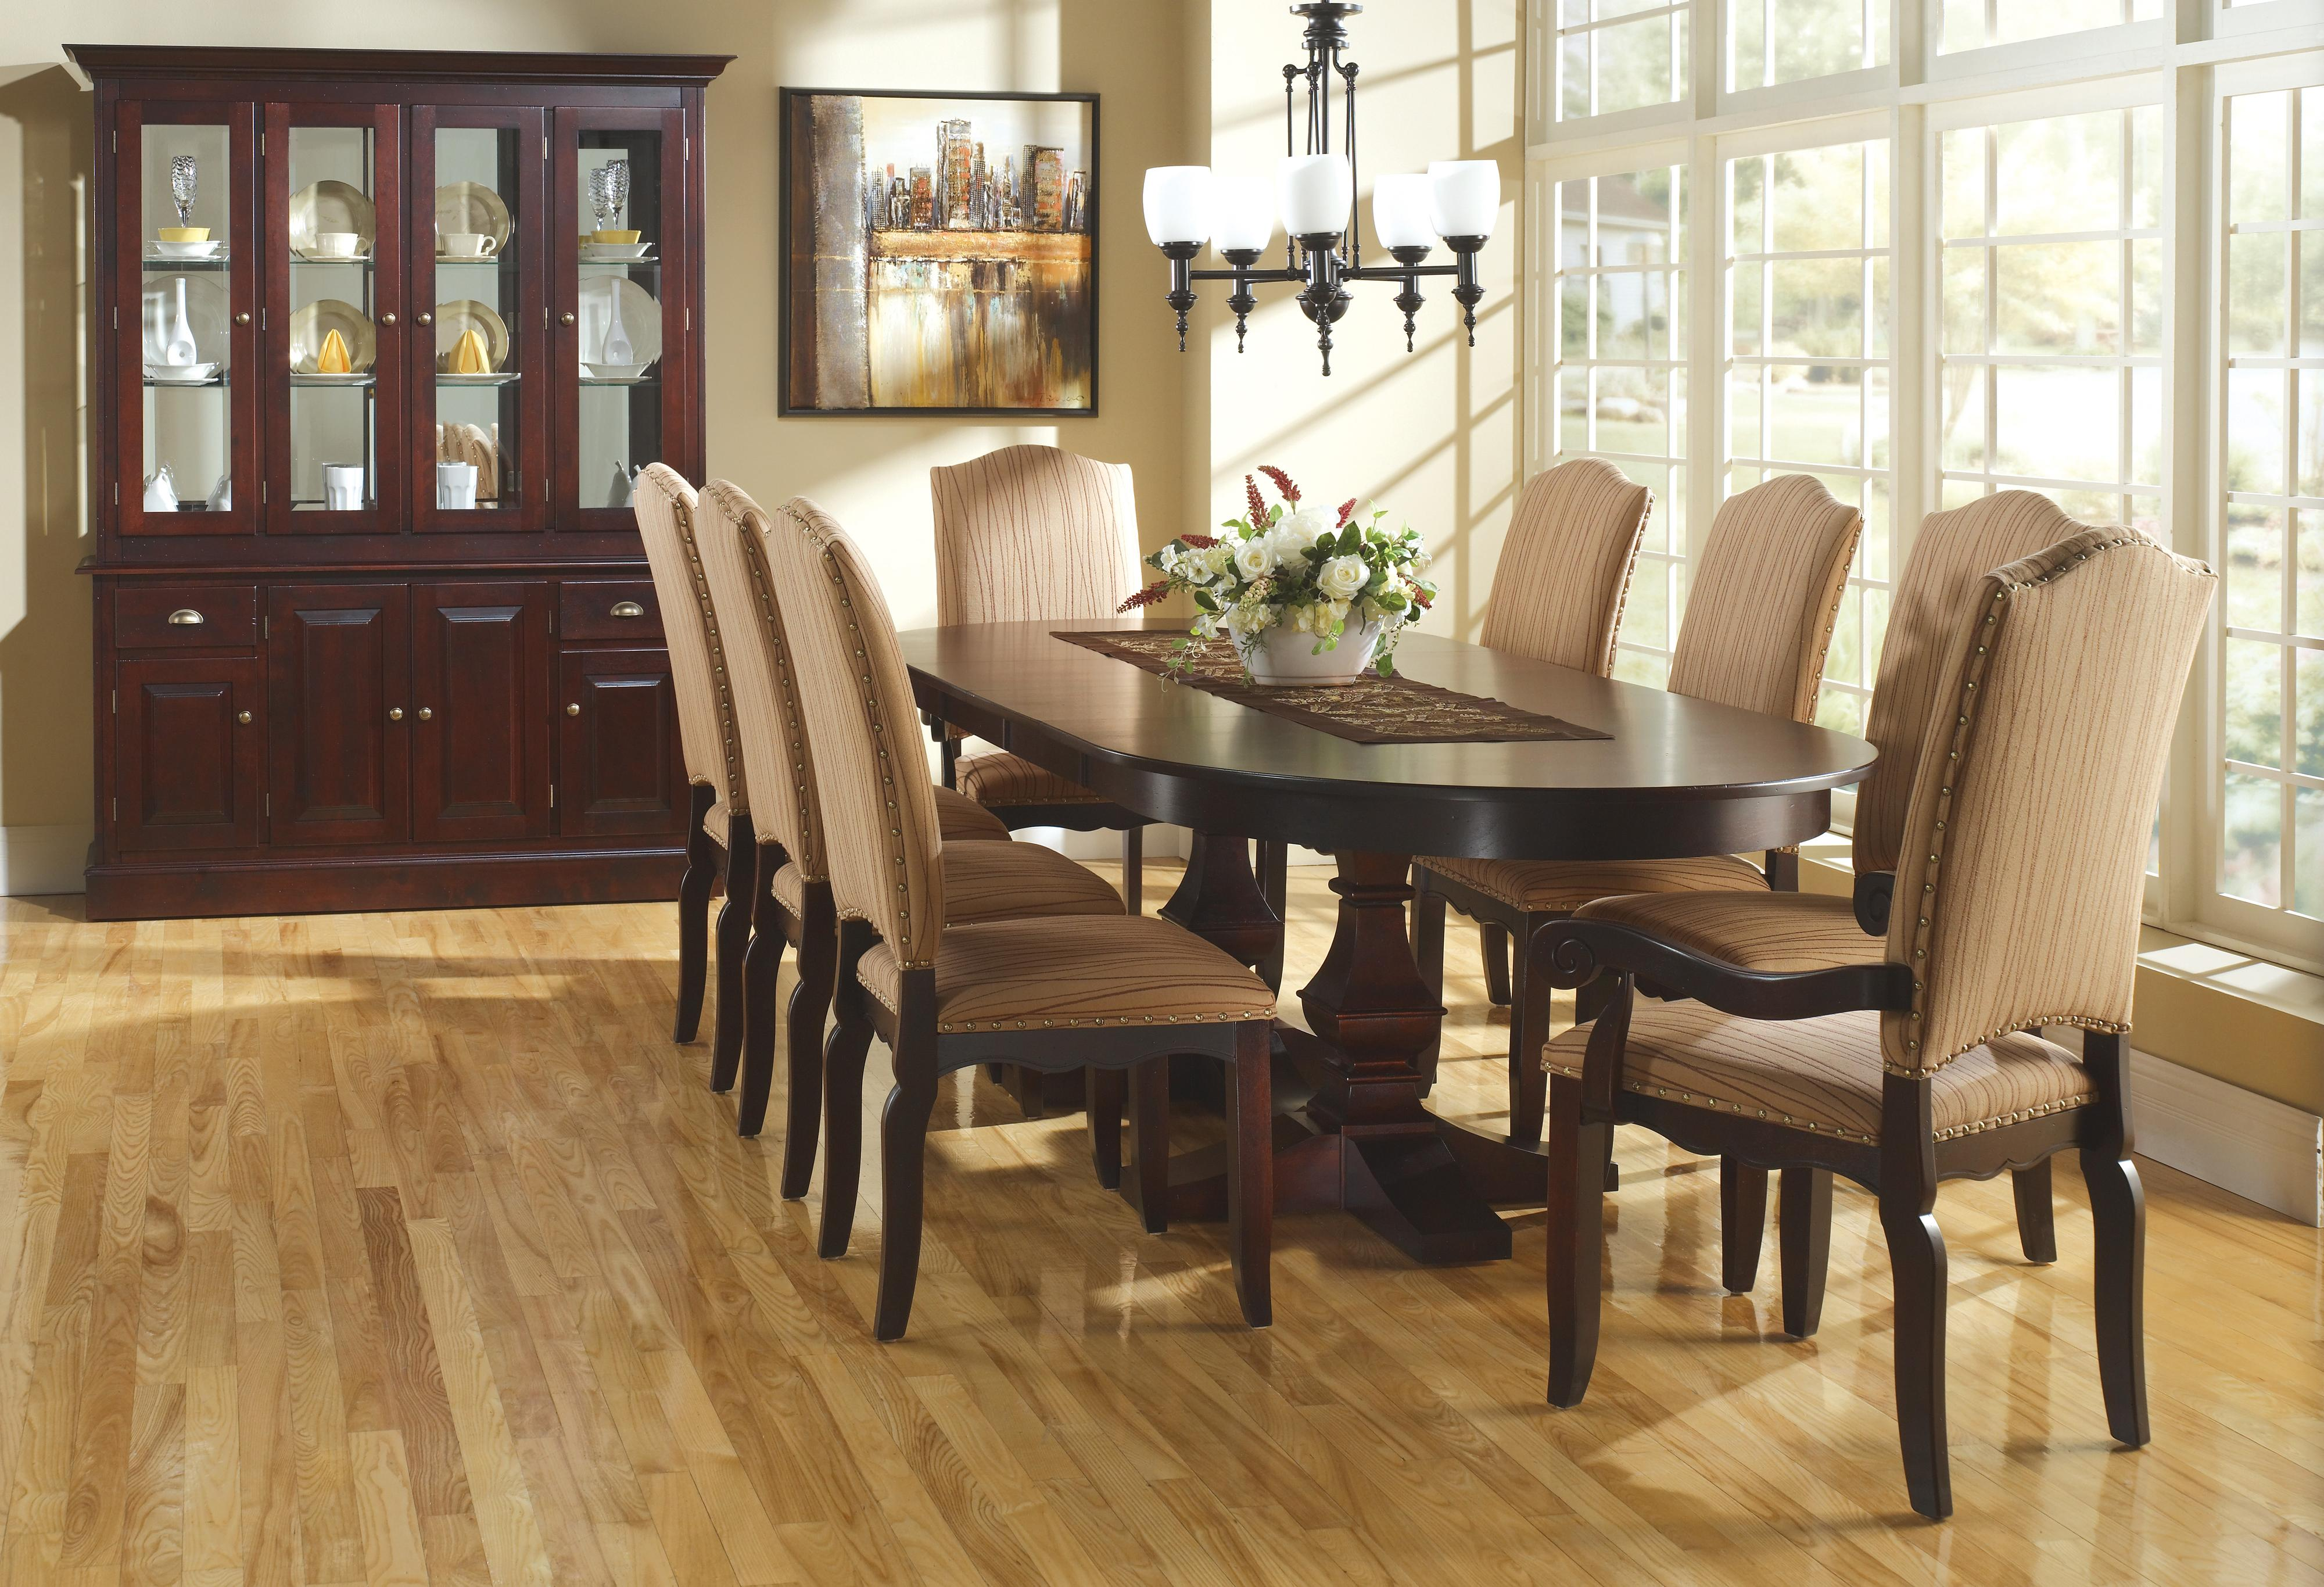 canadel custom dining customizable oval table with leaves pedestal base steger 39 s furniture. Black Bedroom Furniture Sets. Home Design Ideas